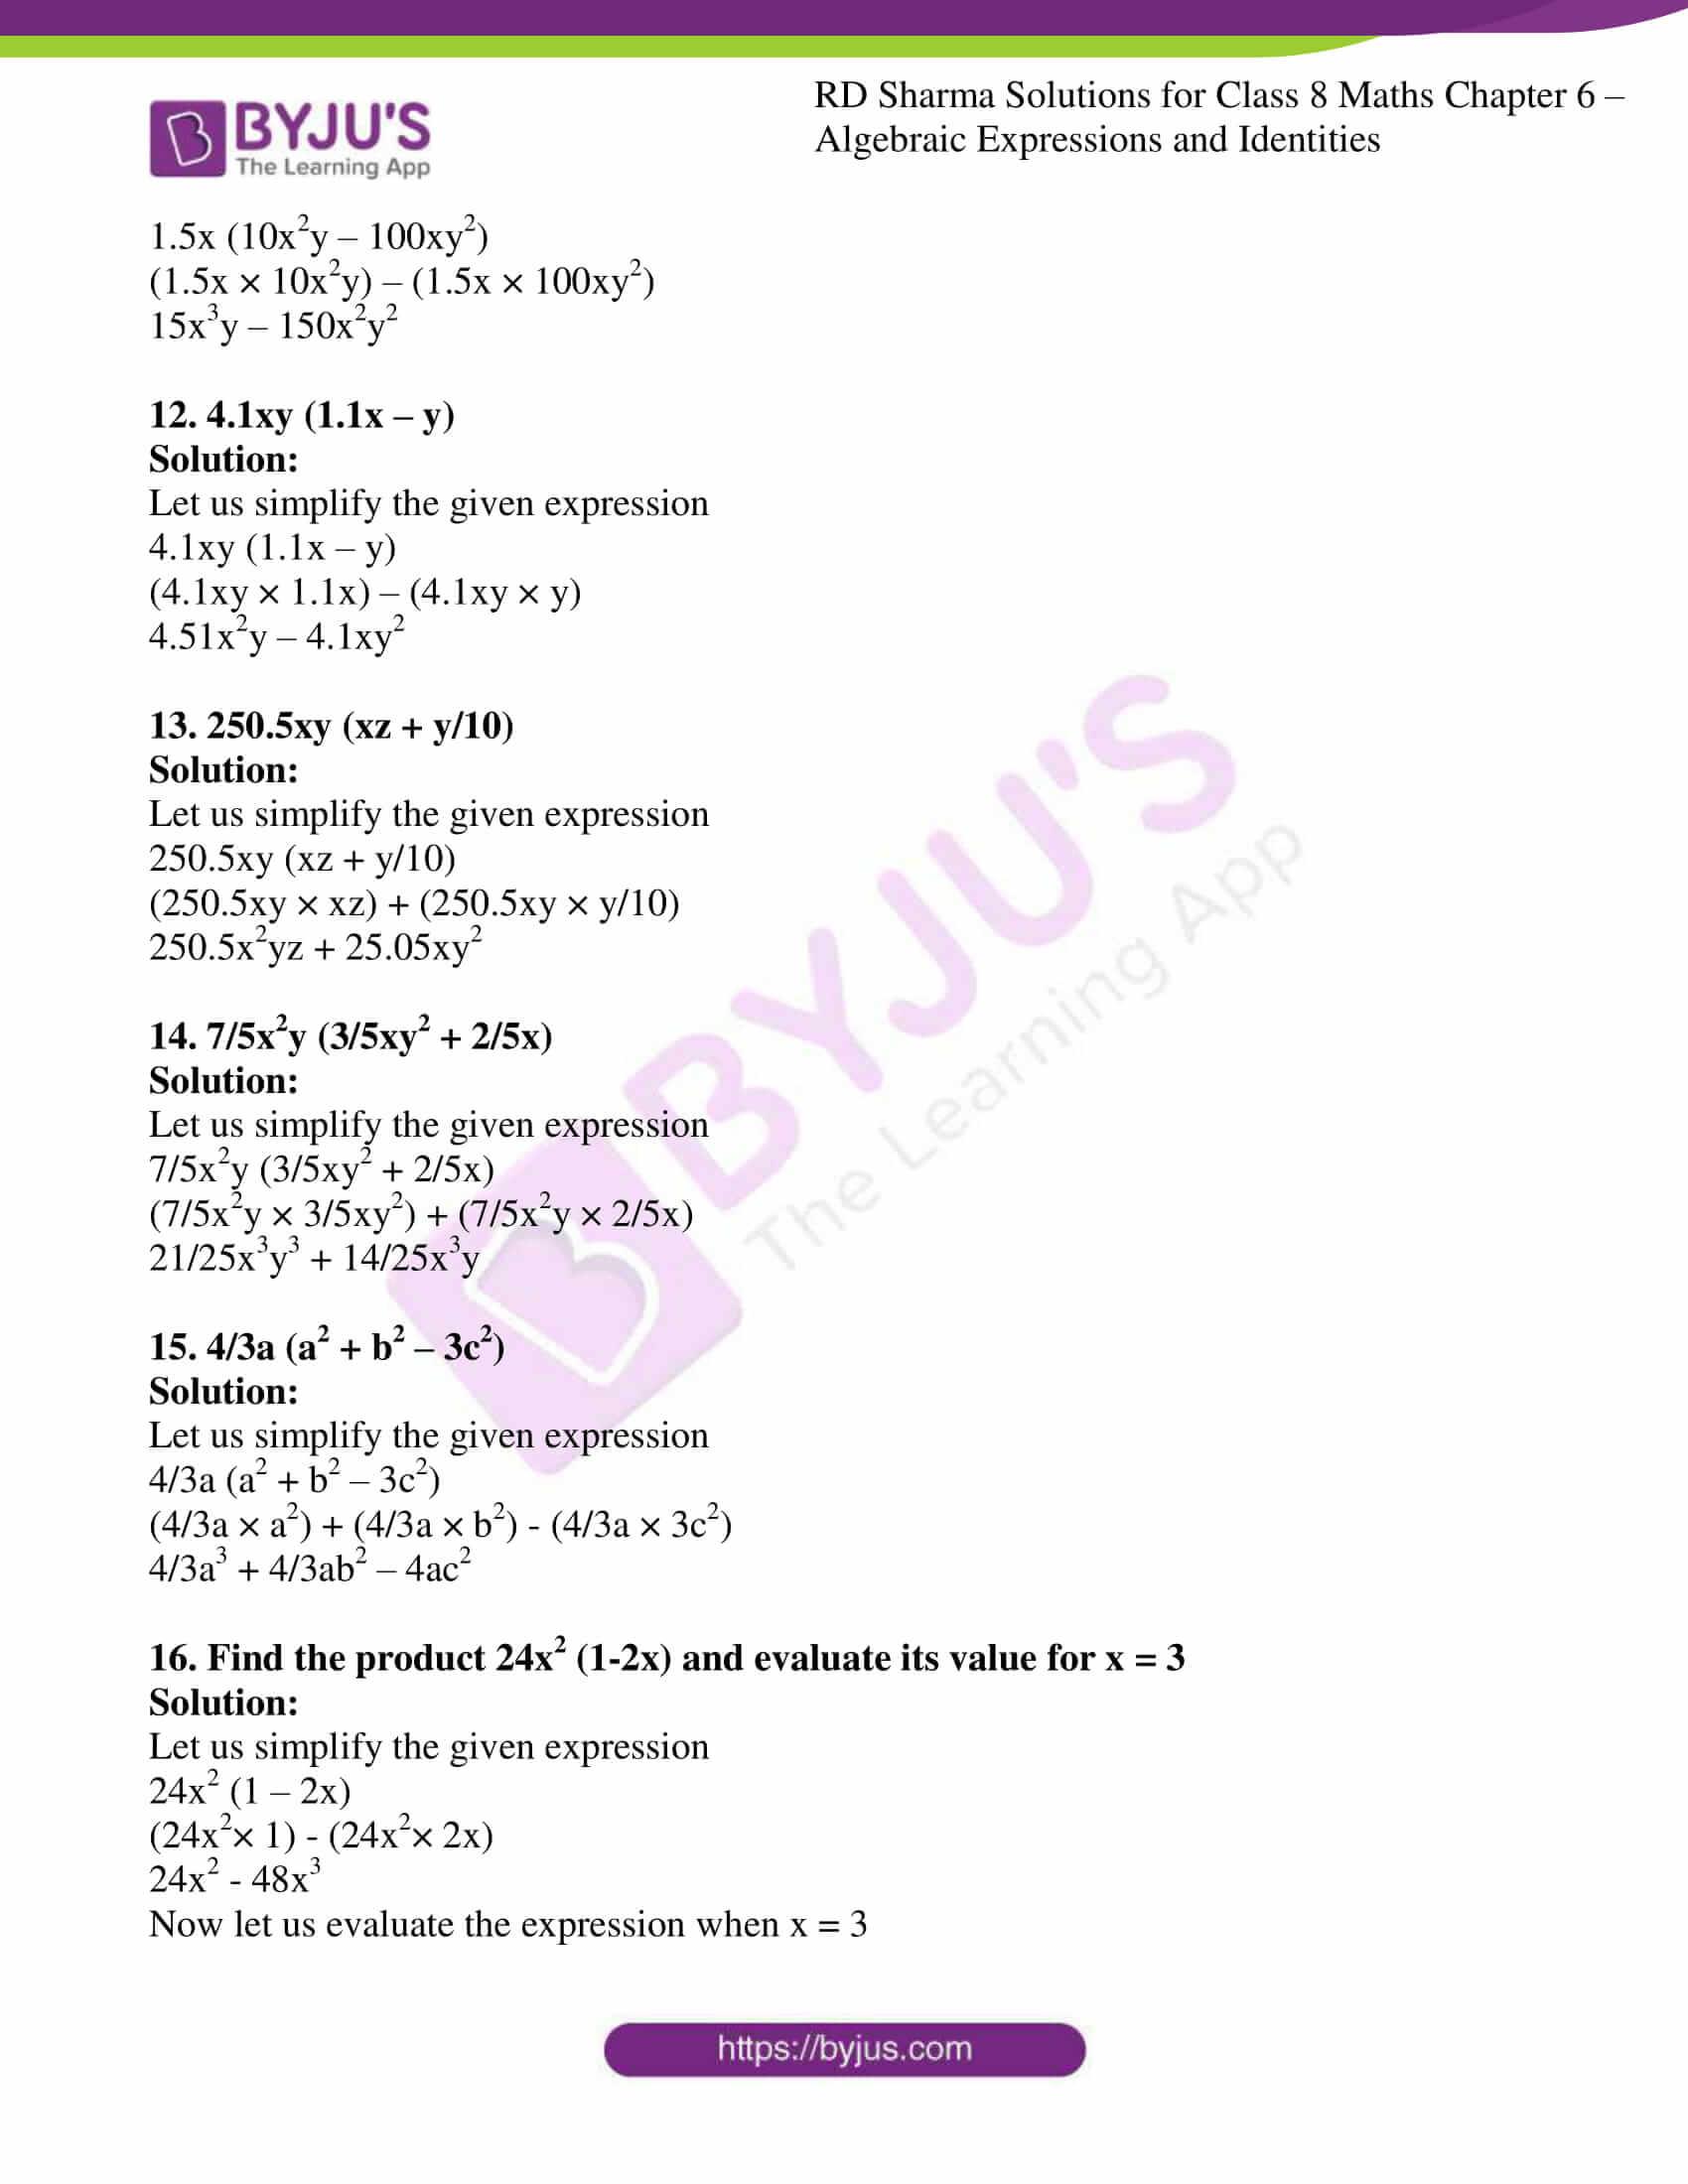 rd sharma class 8 maths chapter 6 exercise 4 3